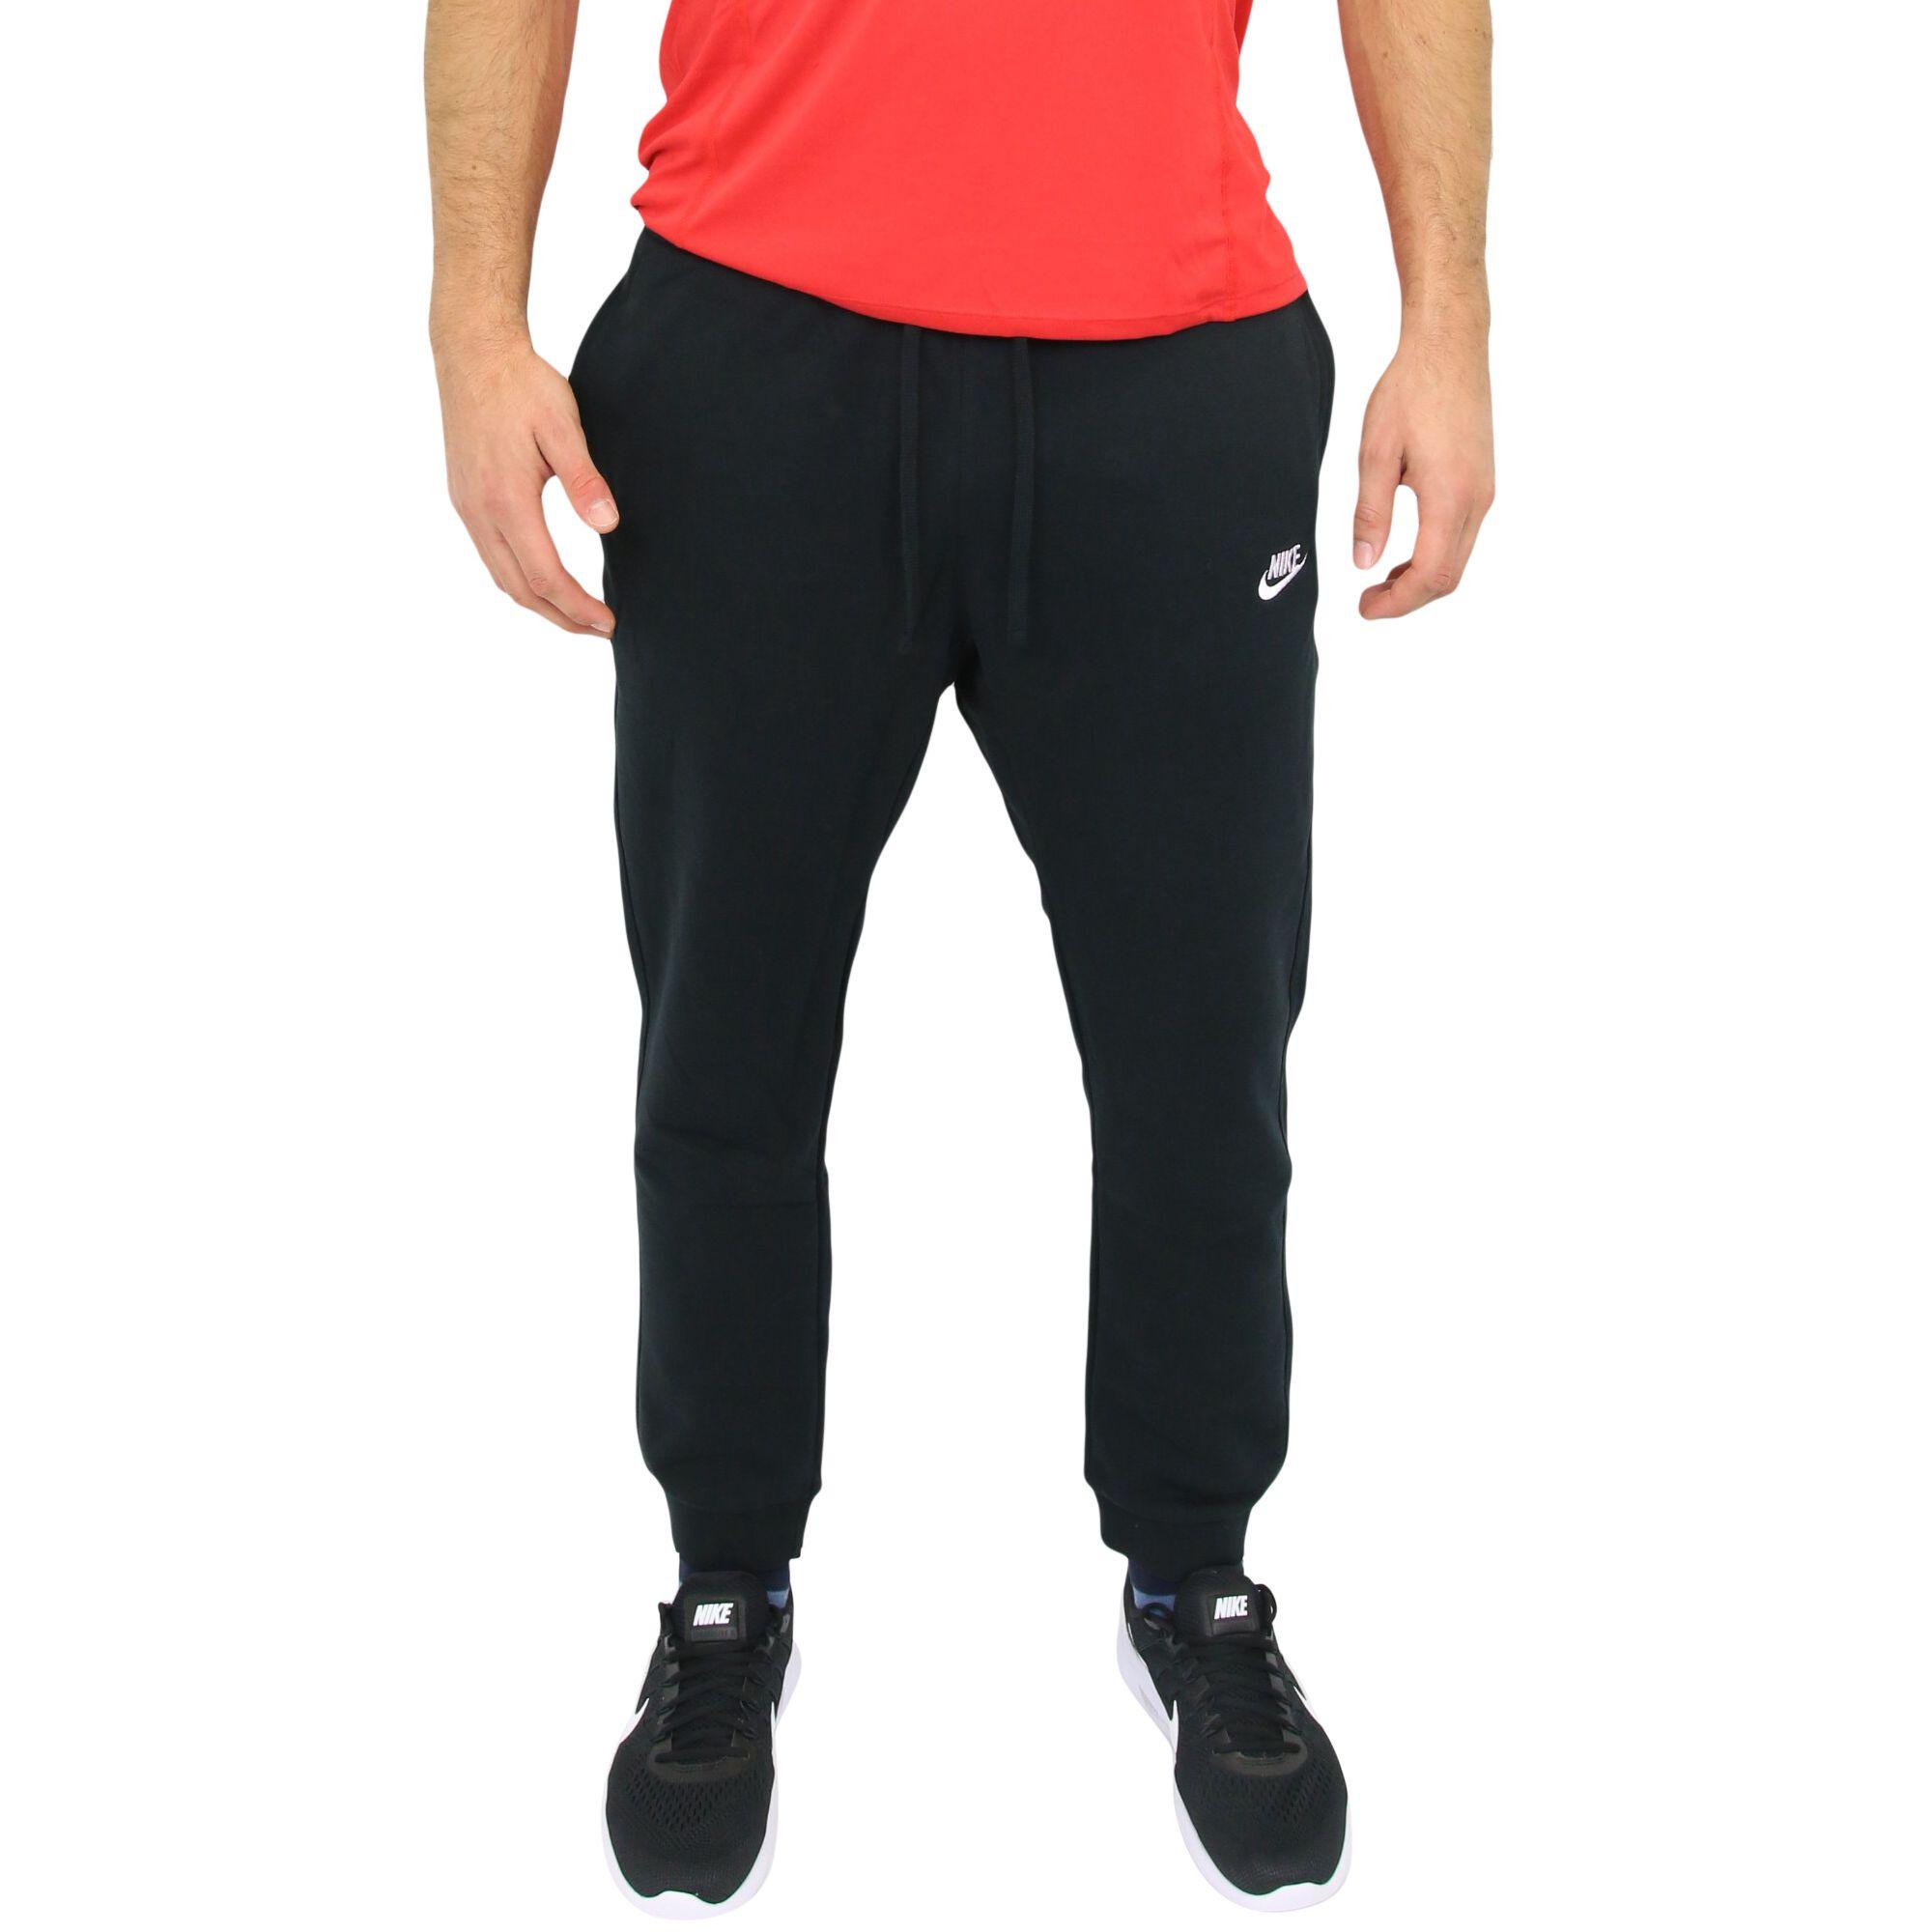 Details zu Nike Sportswear Joggers Hose Jogginghose Trainingshose Herren 804465 010 Schwarz